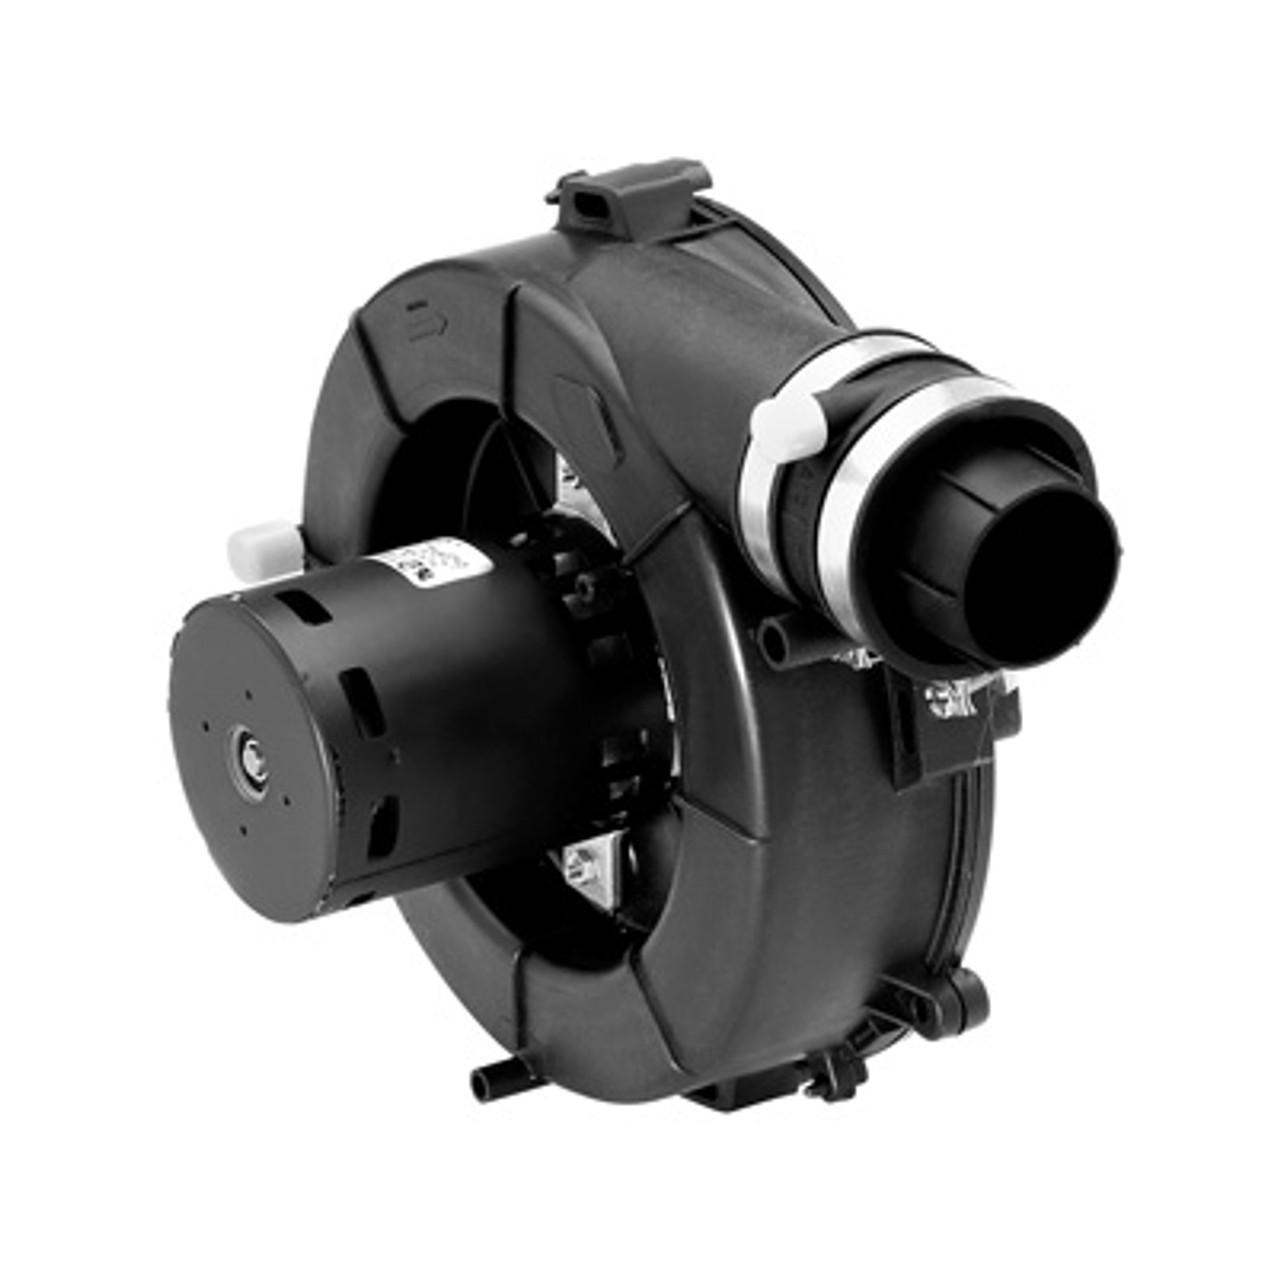 Lennox Furnace Draft Inducer Blower 115v  46087-001  45037-1p  Fasco   A202